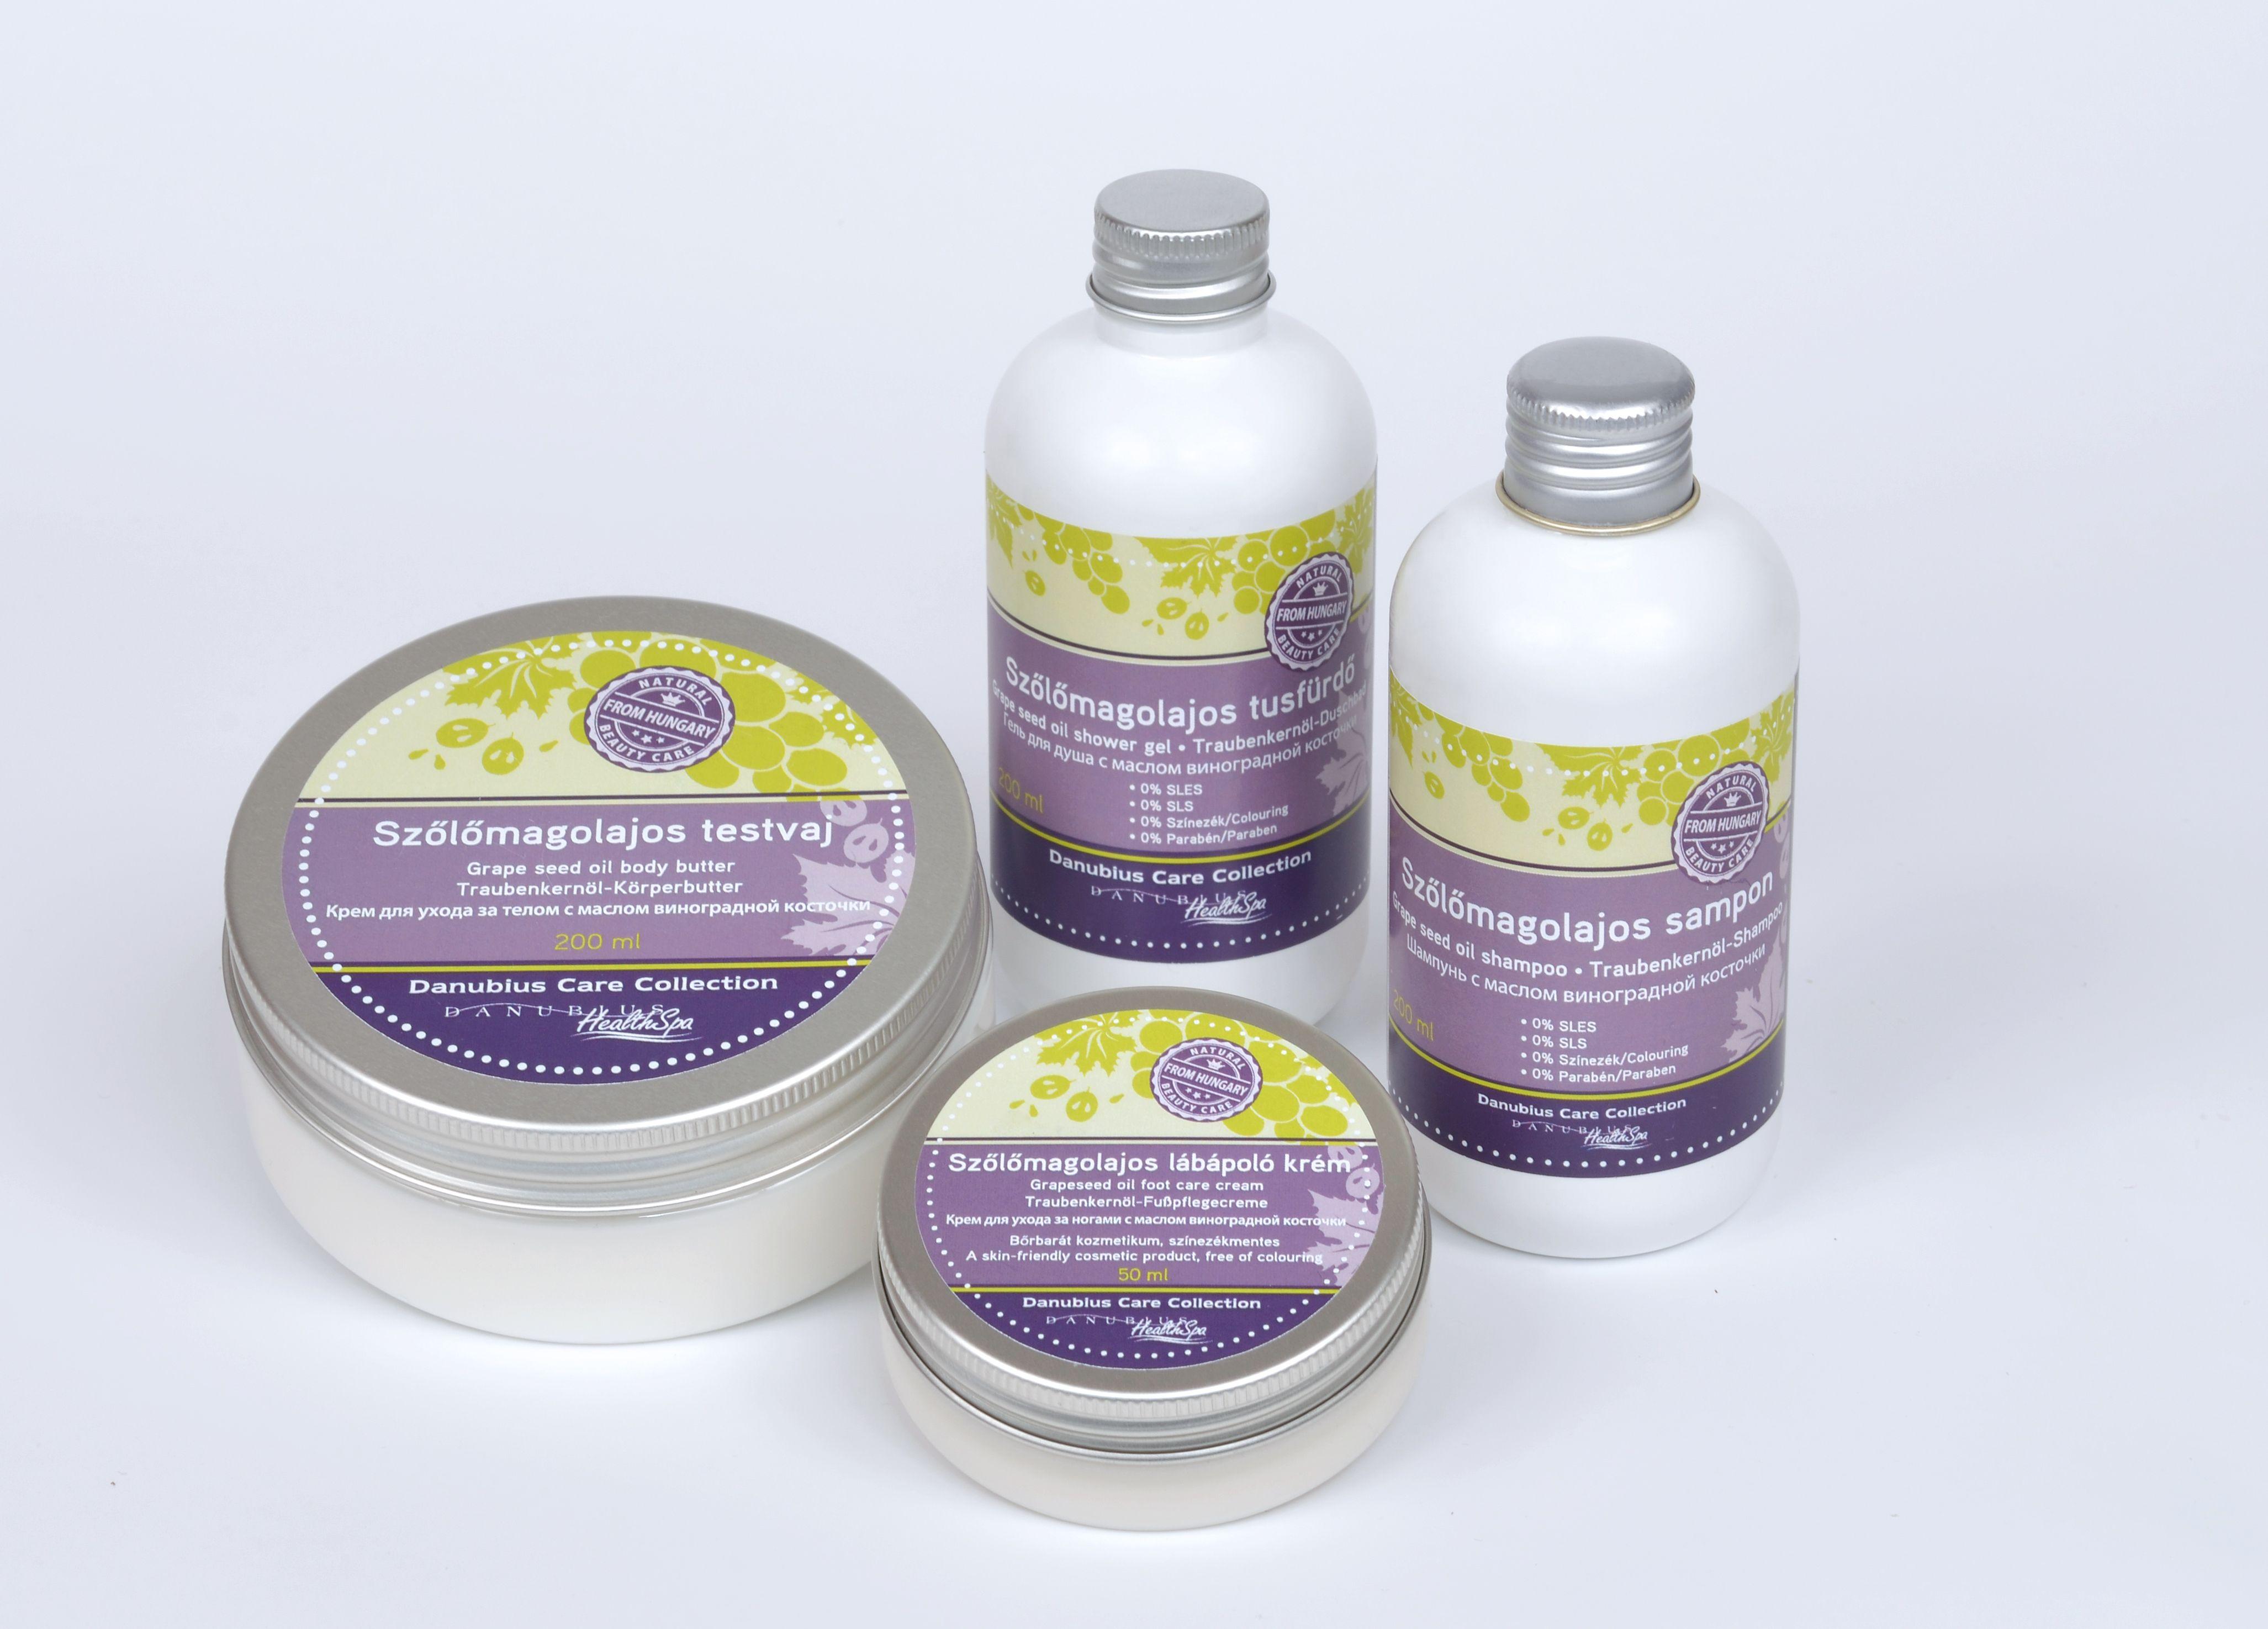 Danubius Care Collection szőlőmagolajos termékcsalád